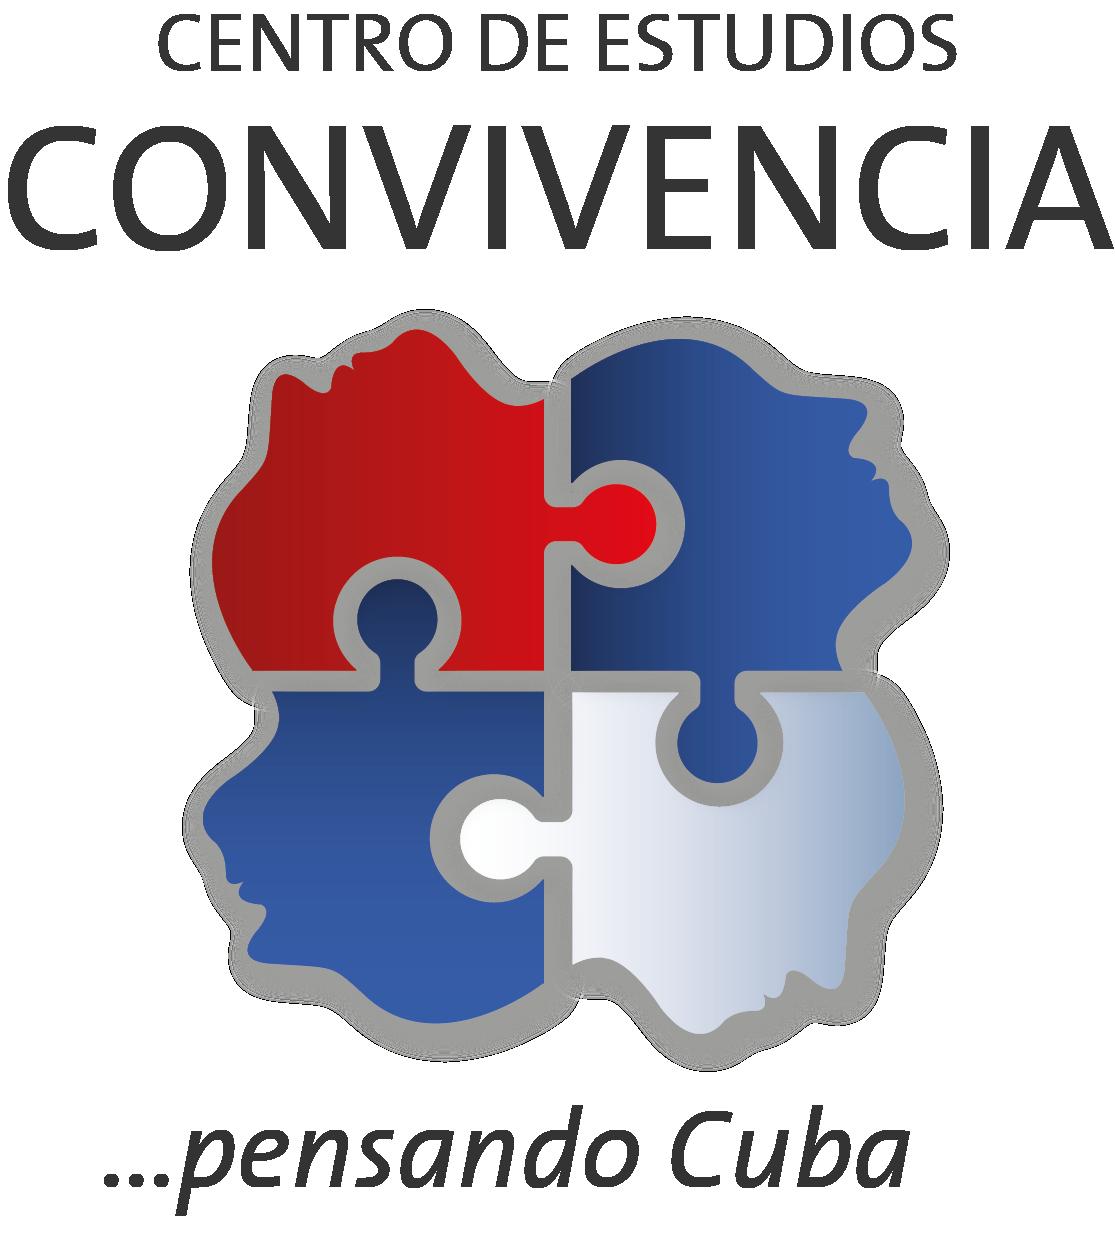 Centro de Estudios Convivencia